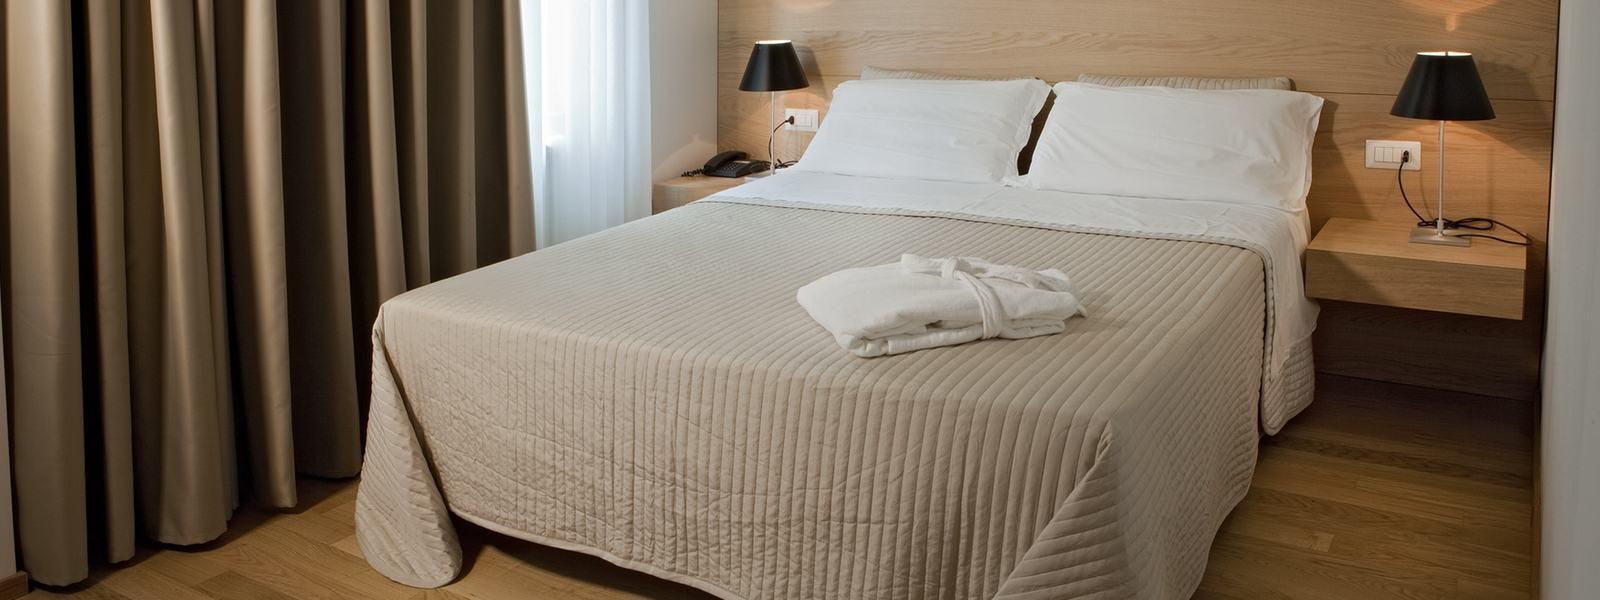 Hotel acquasanta 3